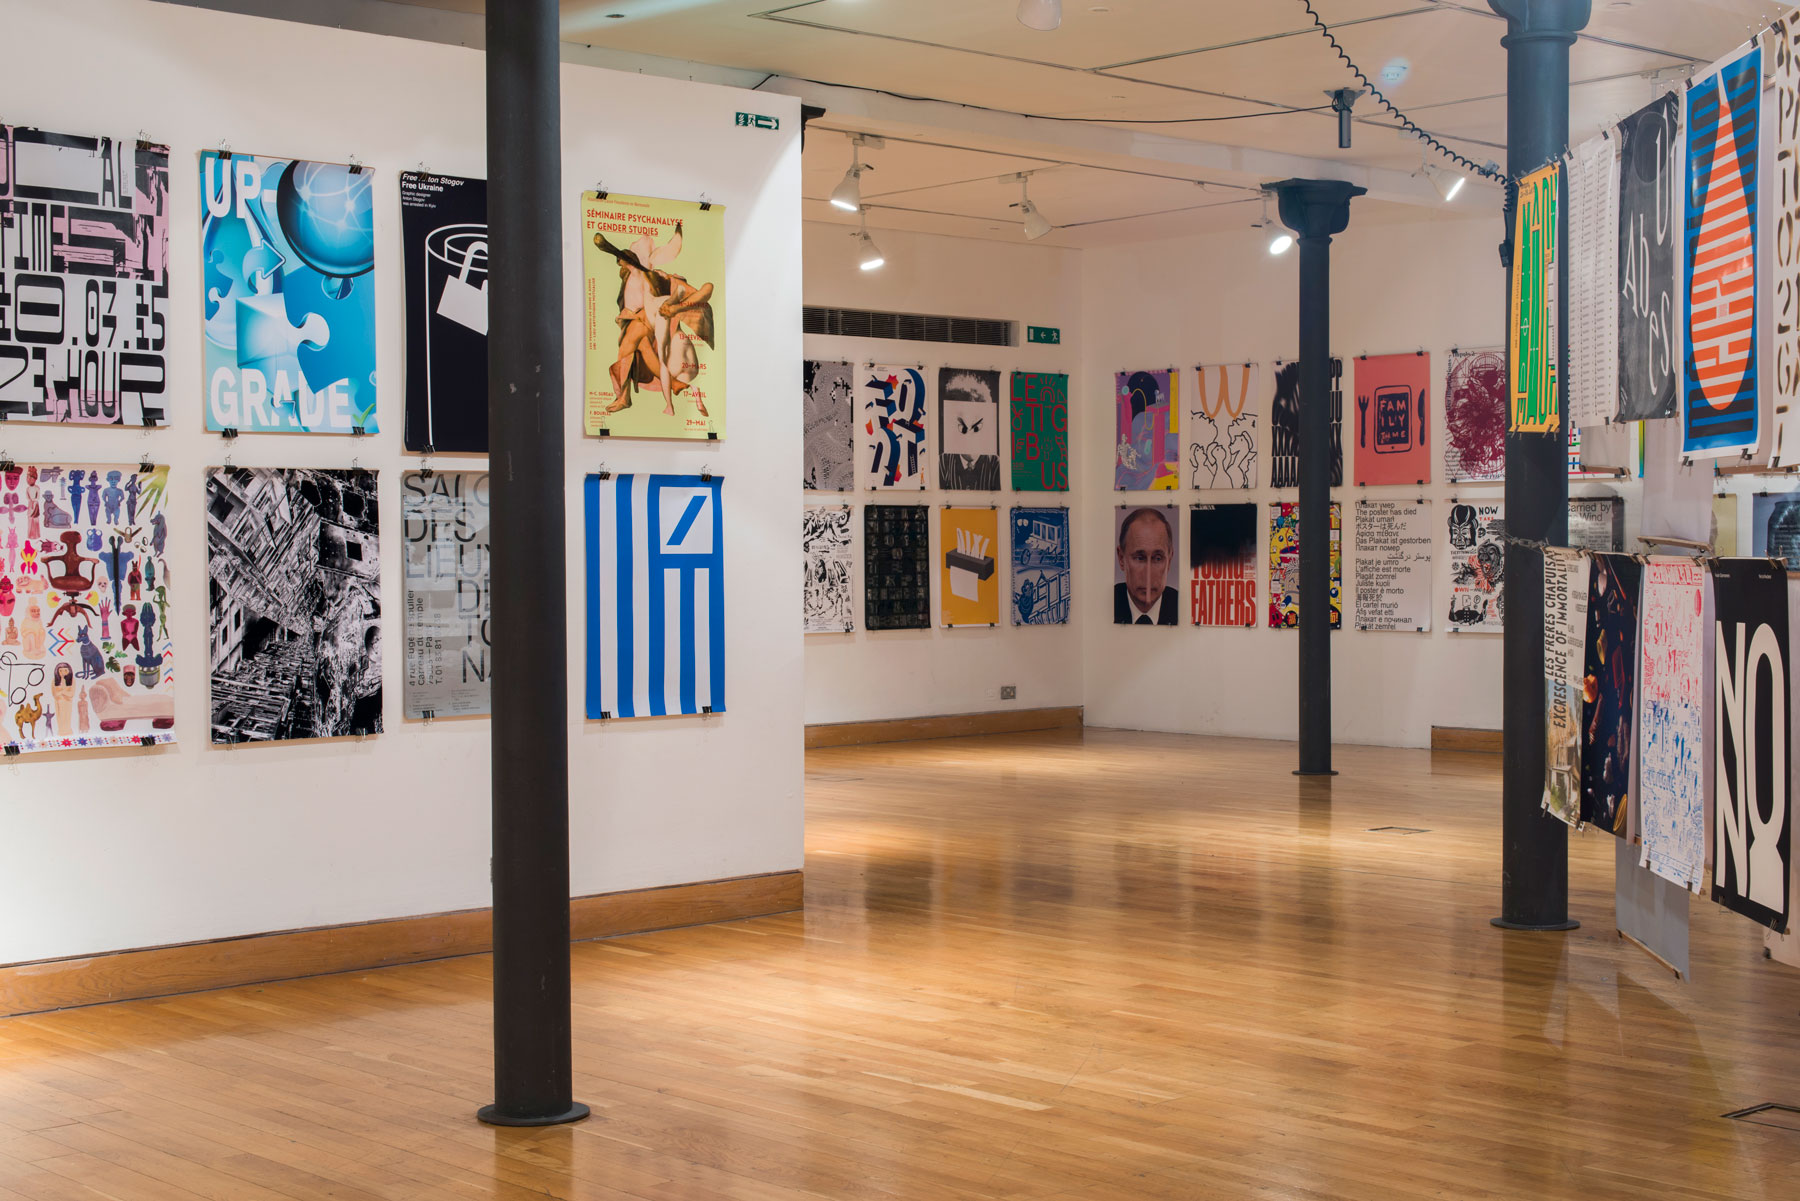 1graphic-design-festival-scotland-international-poster-exhib-15